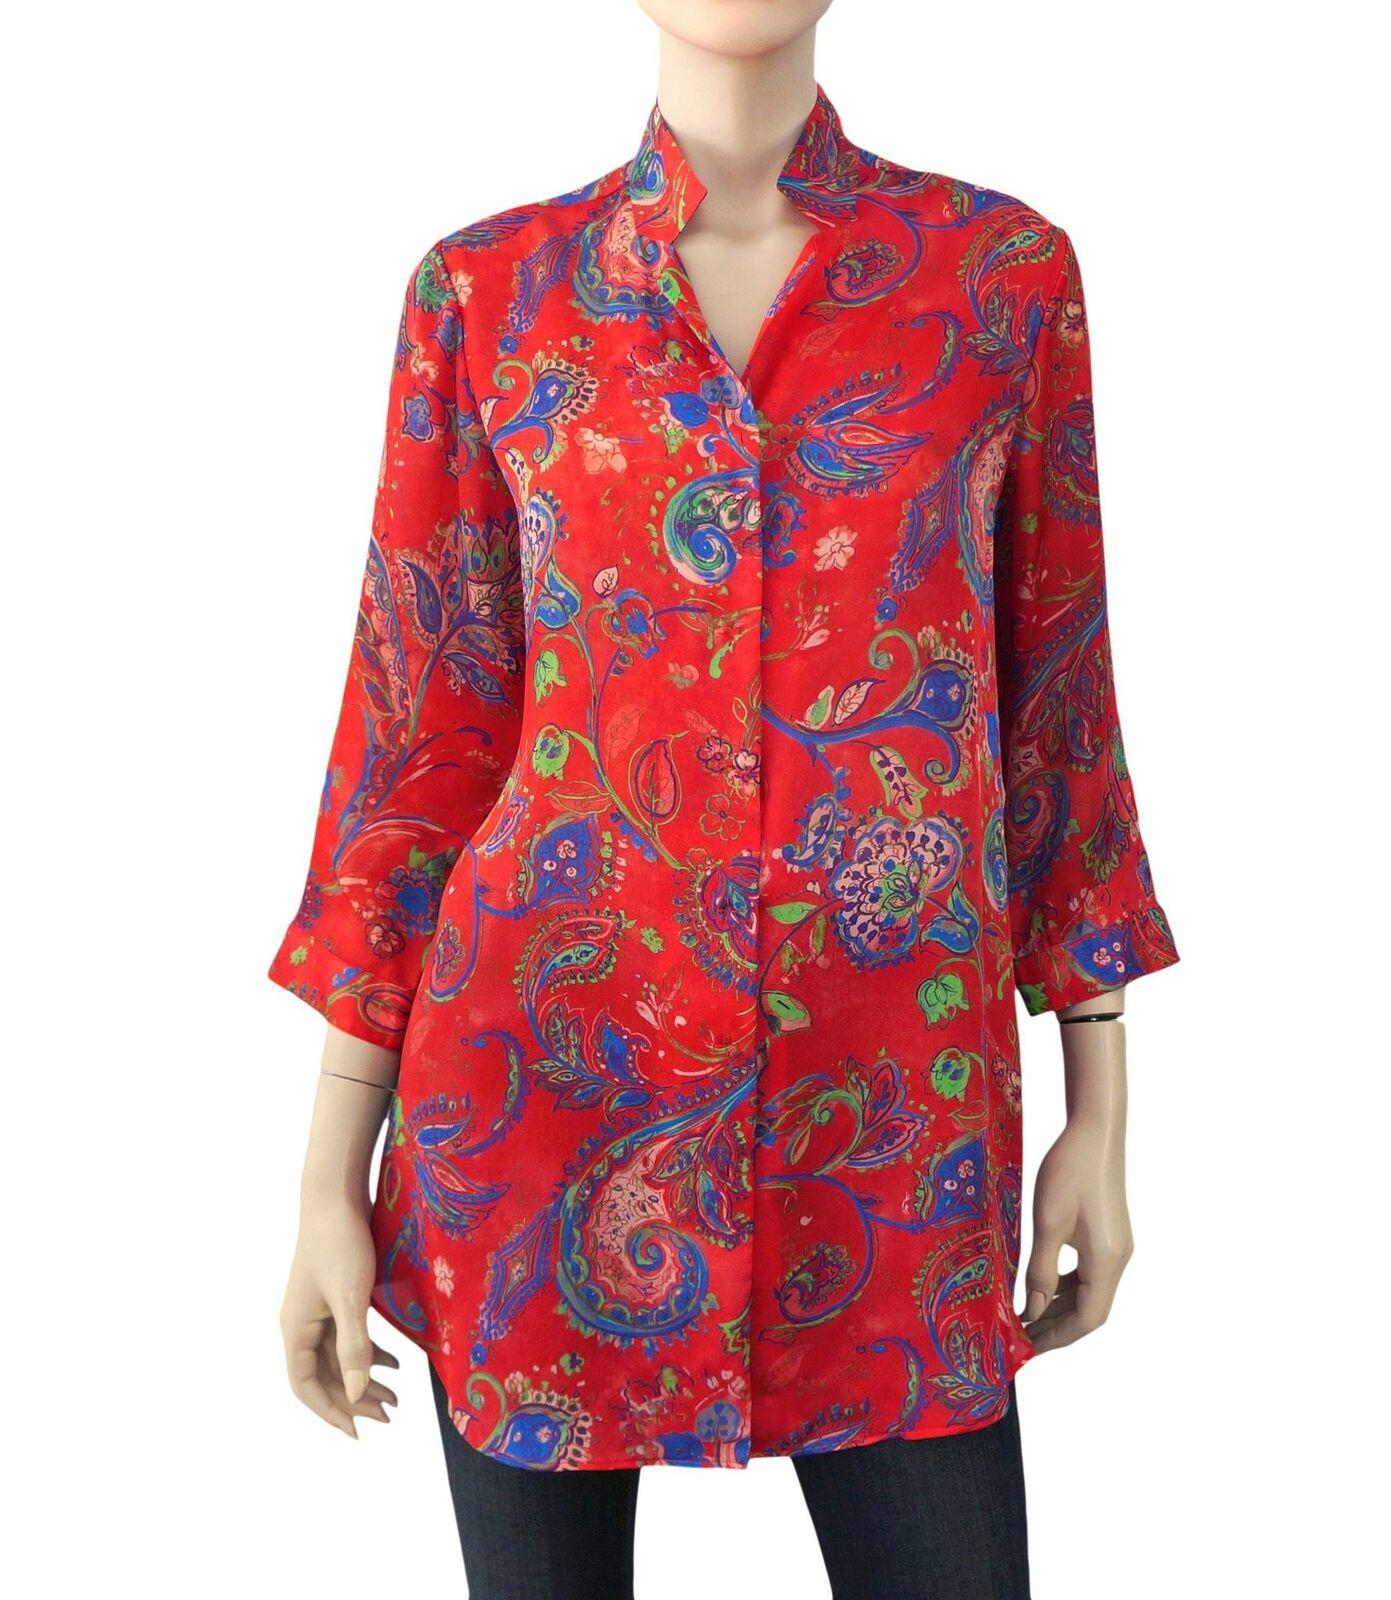 LEGGIADRO rot Silk Paisley Printed Button Down Shirt Tunic Blouse 12